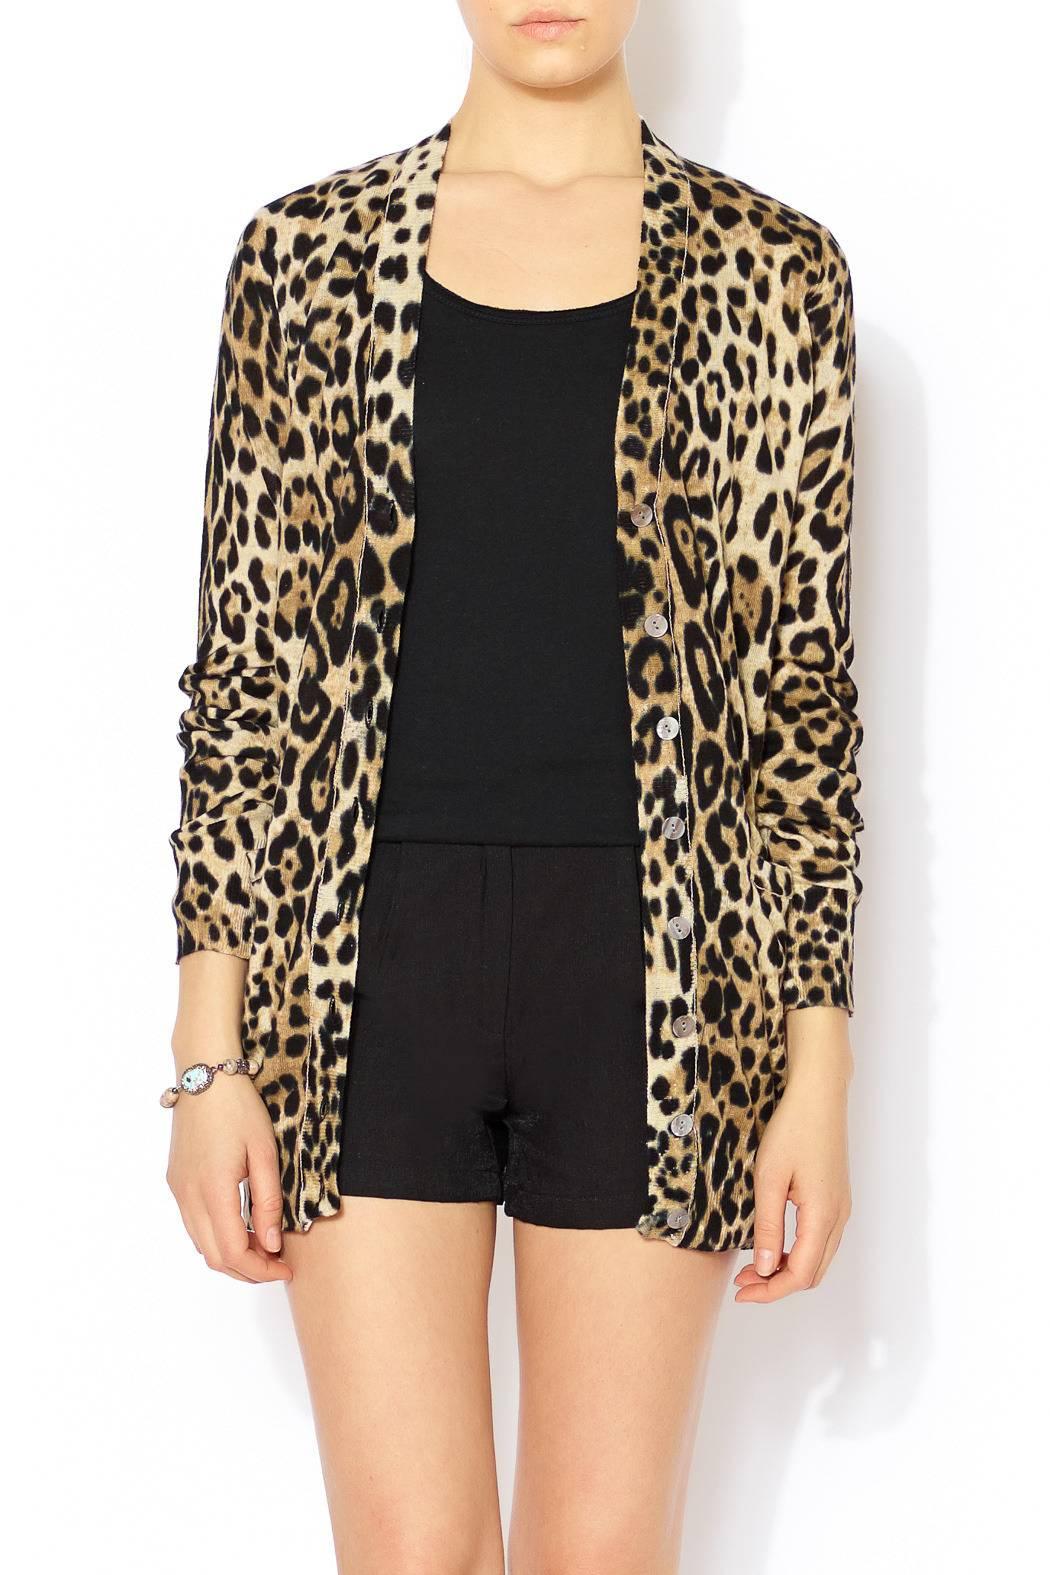 How to Wear Your Leopard Print Cardigan – careyfashion.com